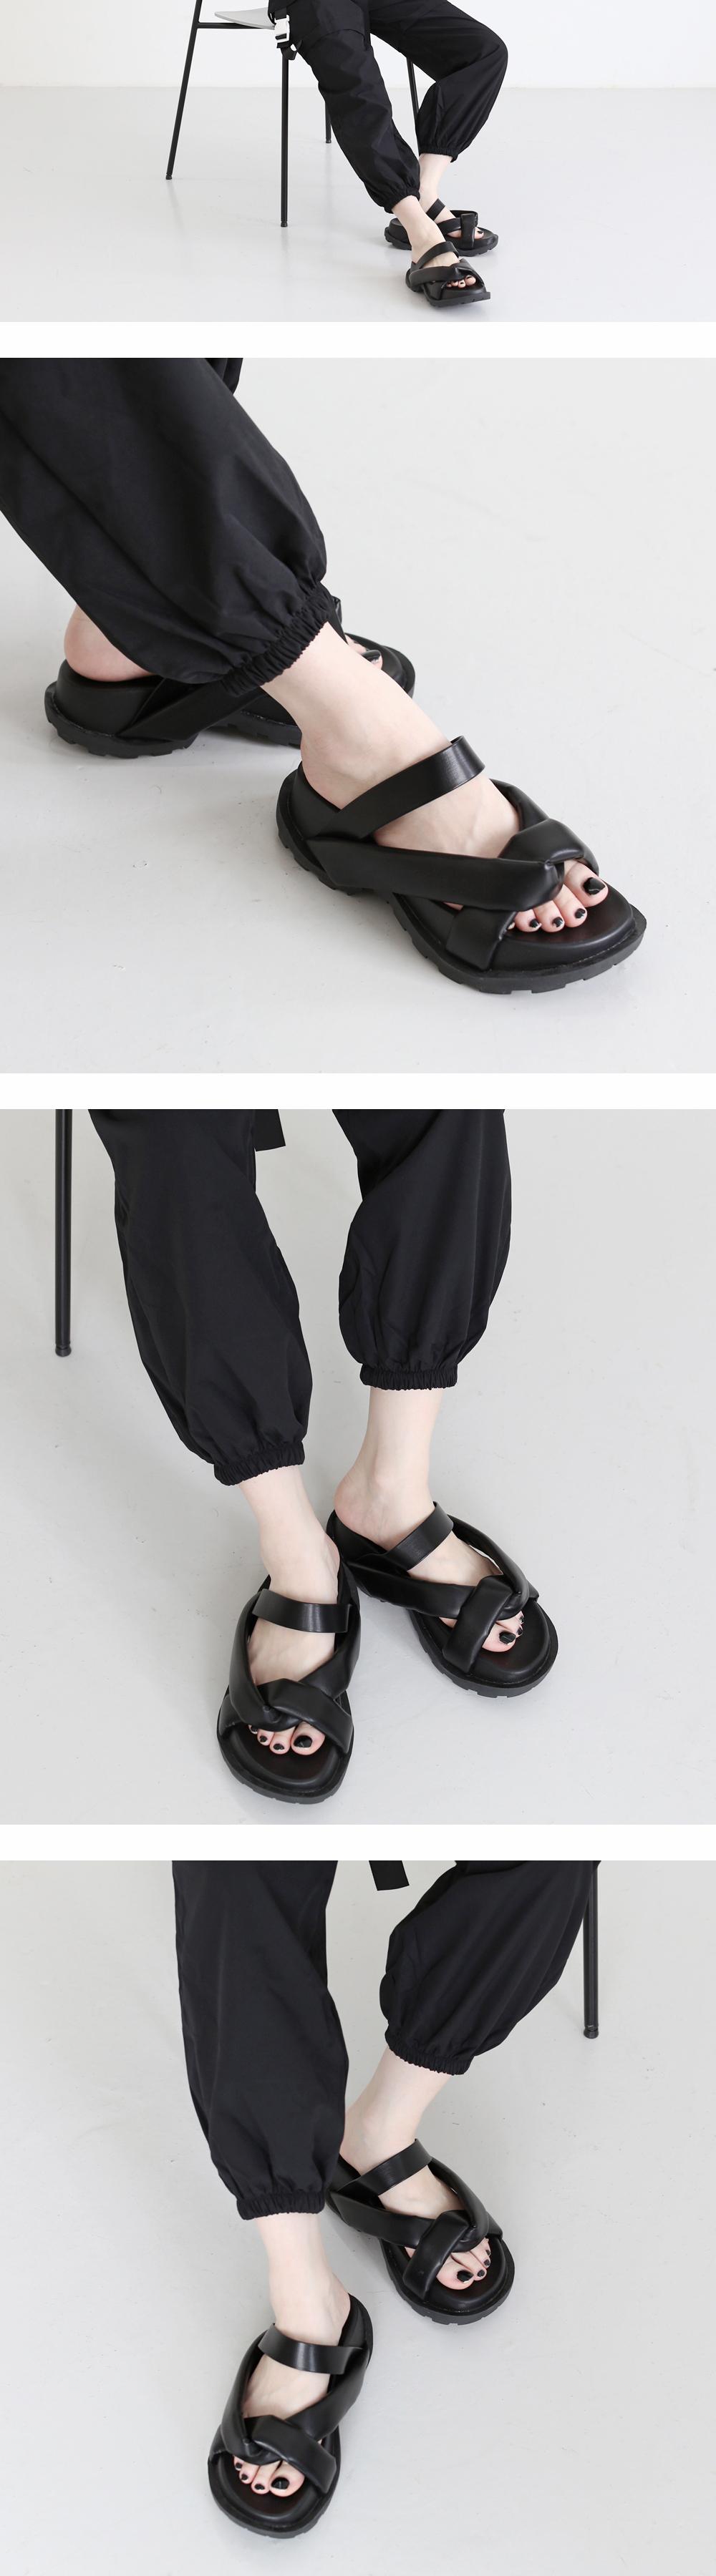 rooney bold strap sandals